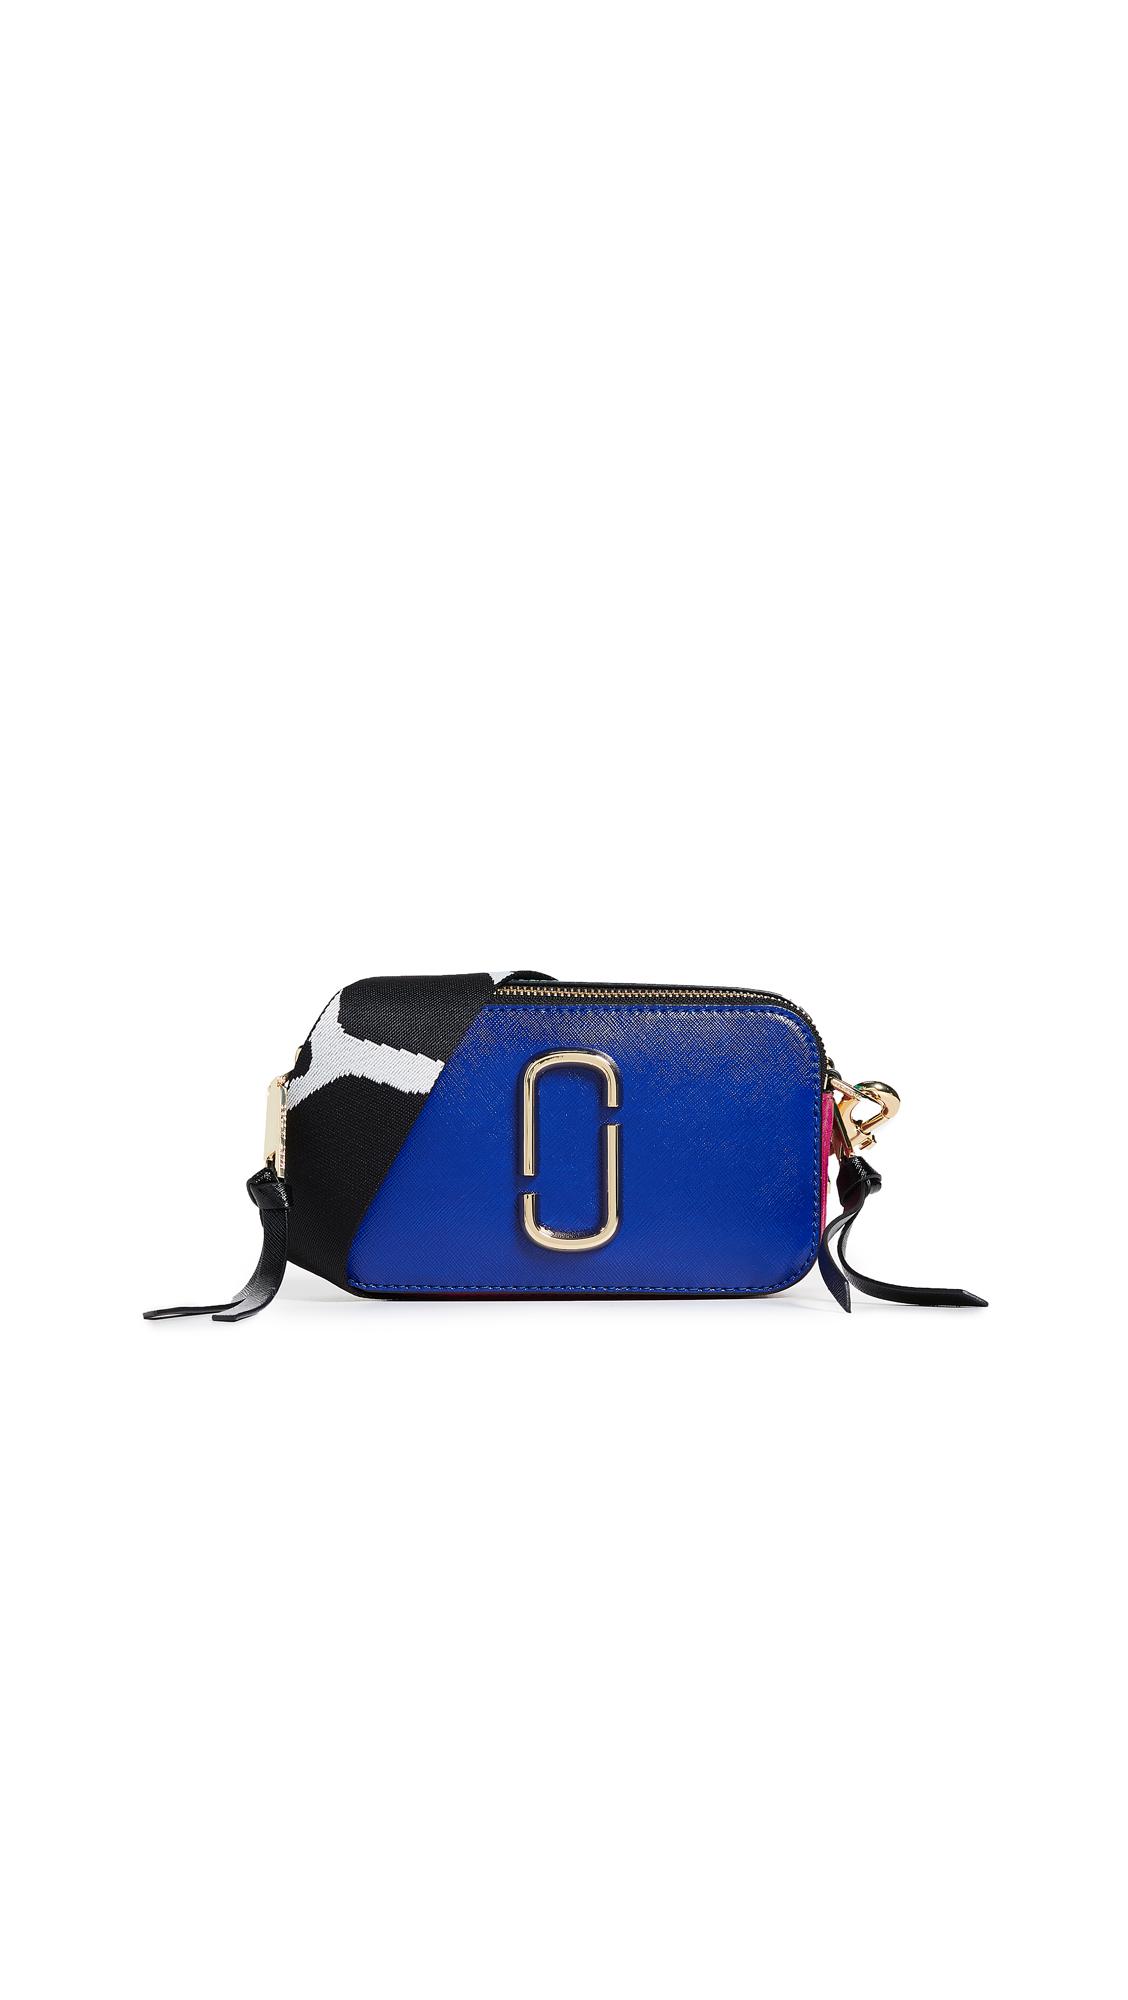 Marc Jacobs Snapshot Crossbody Bag - Academy Blue Multi